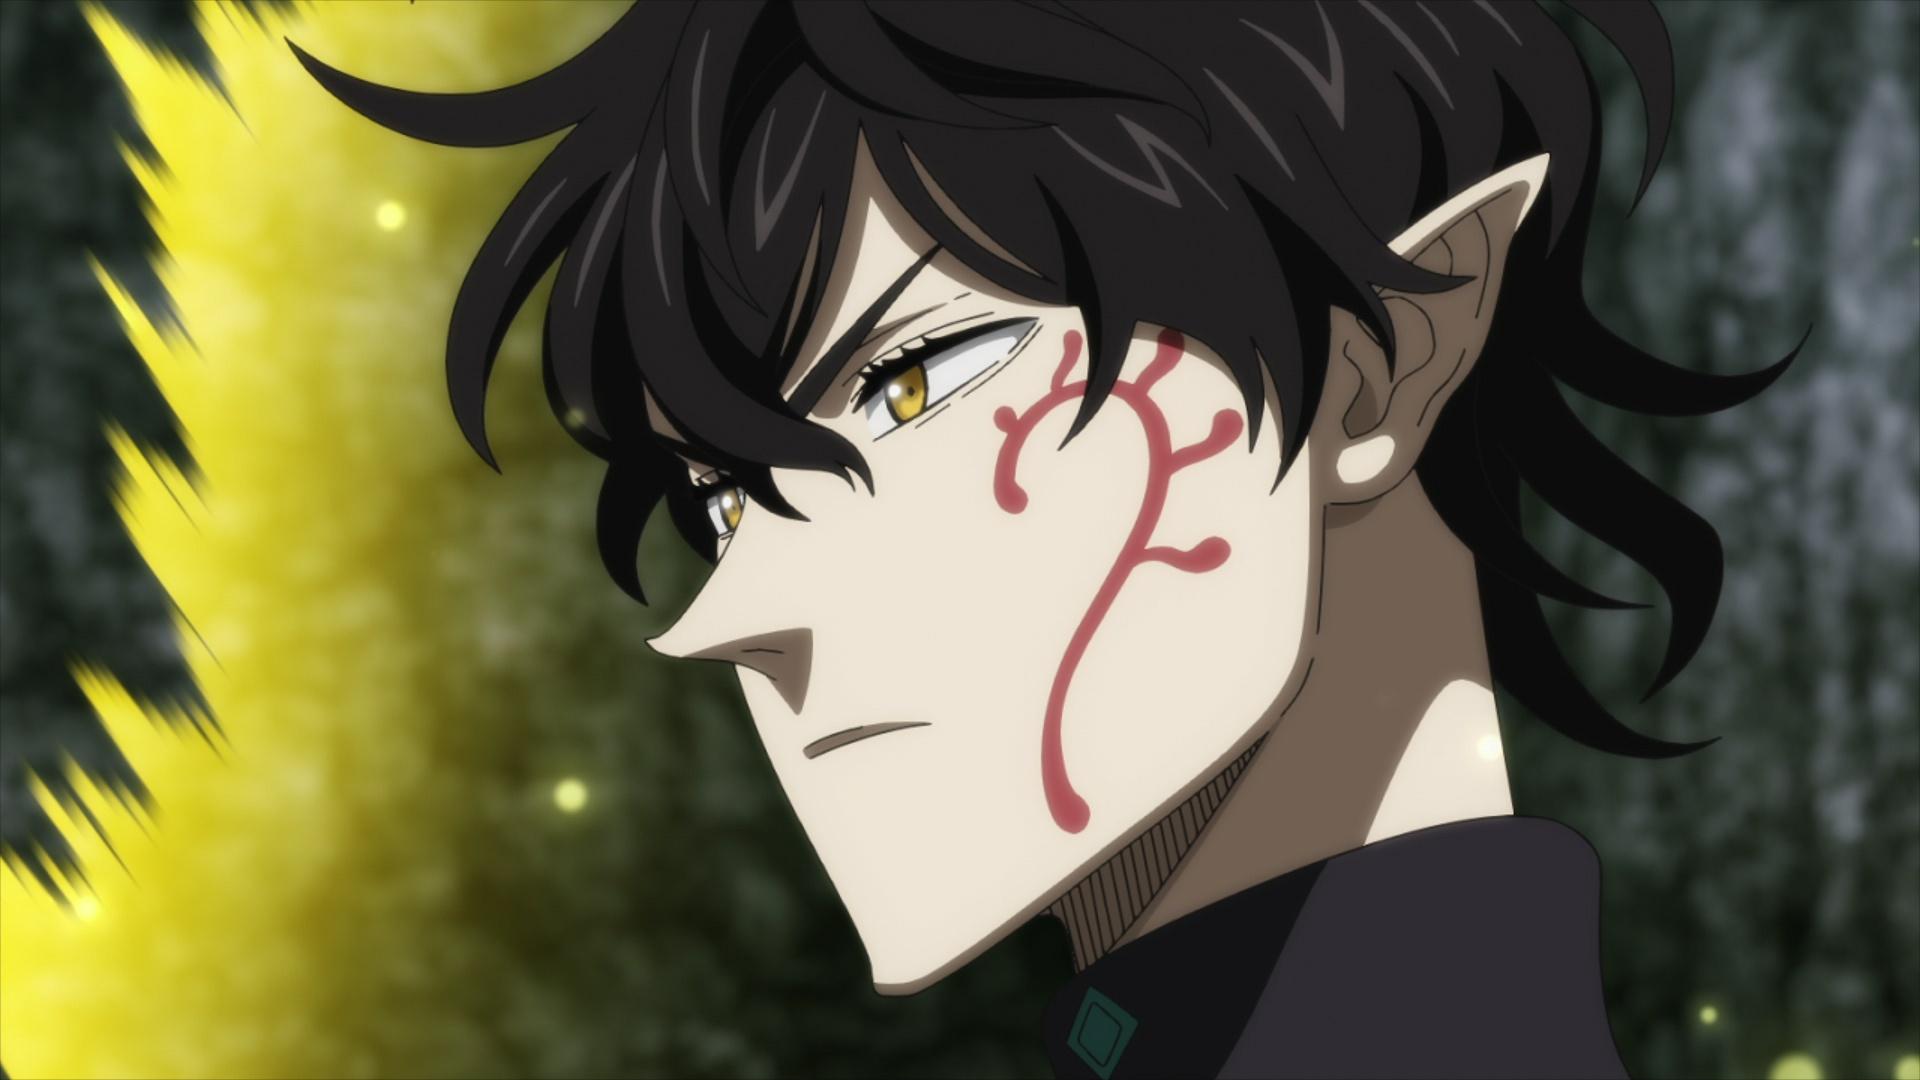 Watch Black Clover Season 2 Episode 100 Sub & Dub | Anime ...